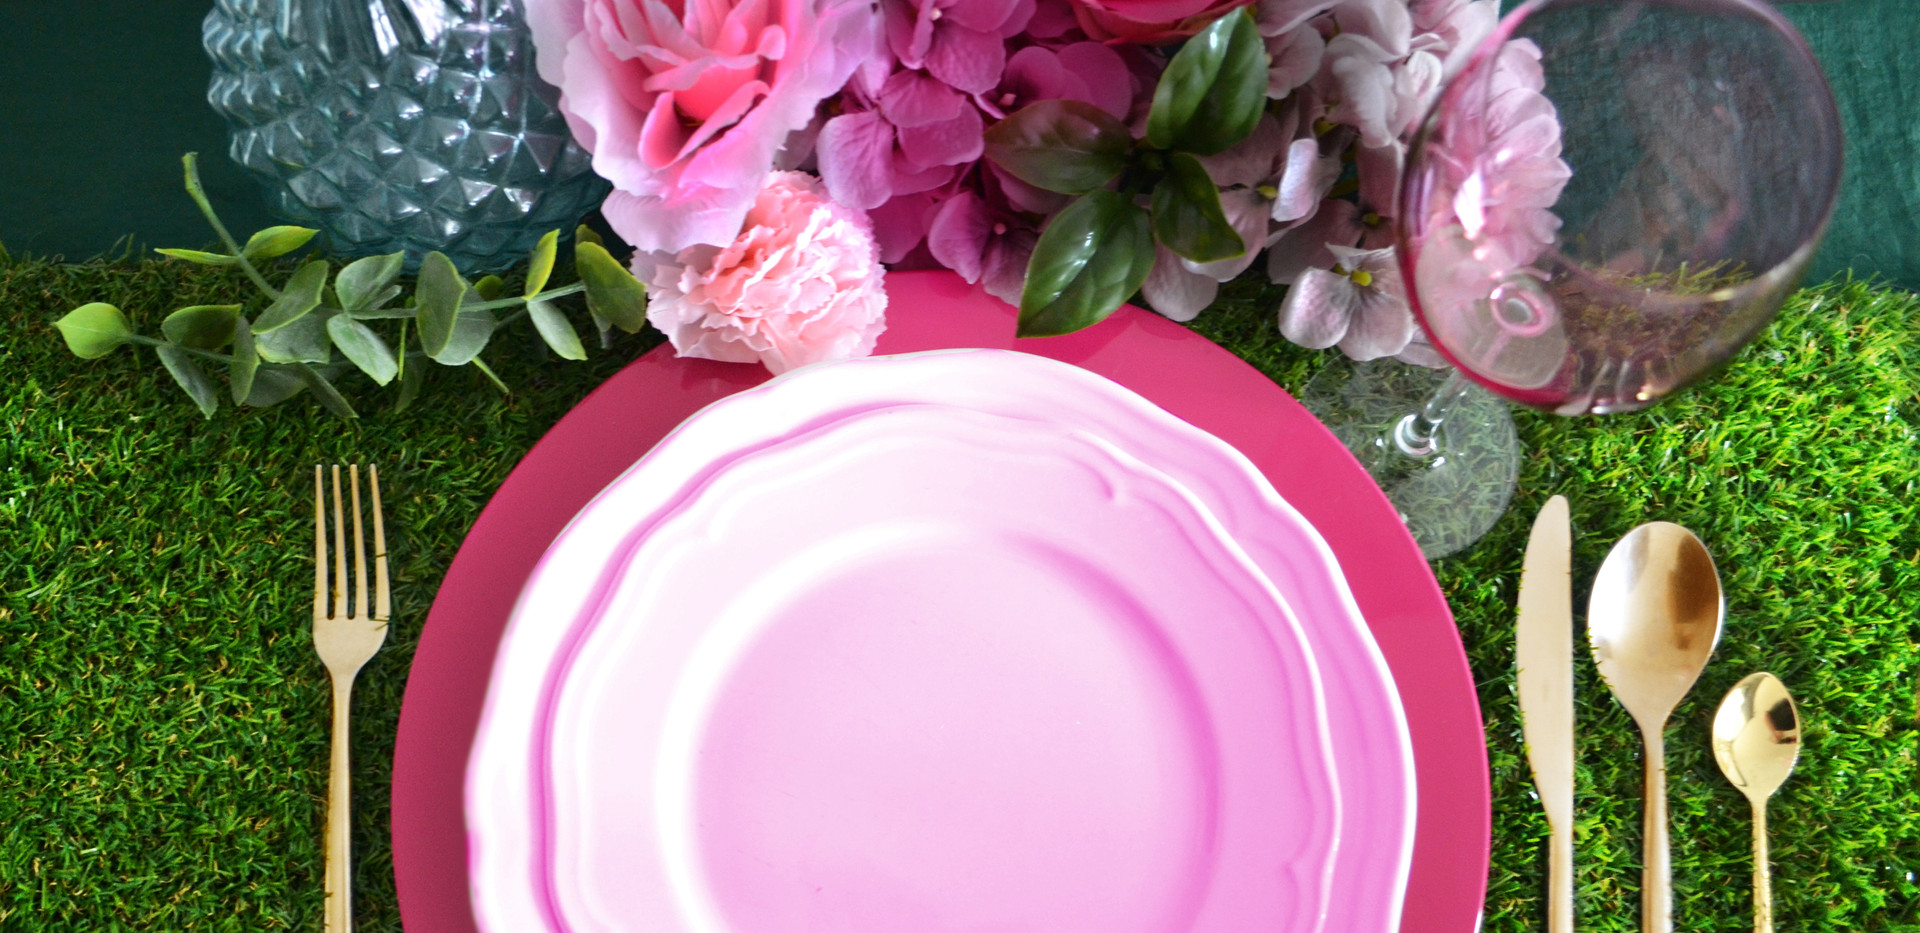 pinkchargerplate